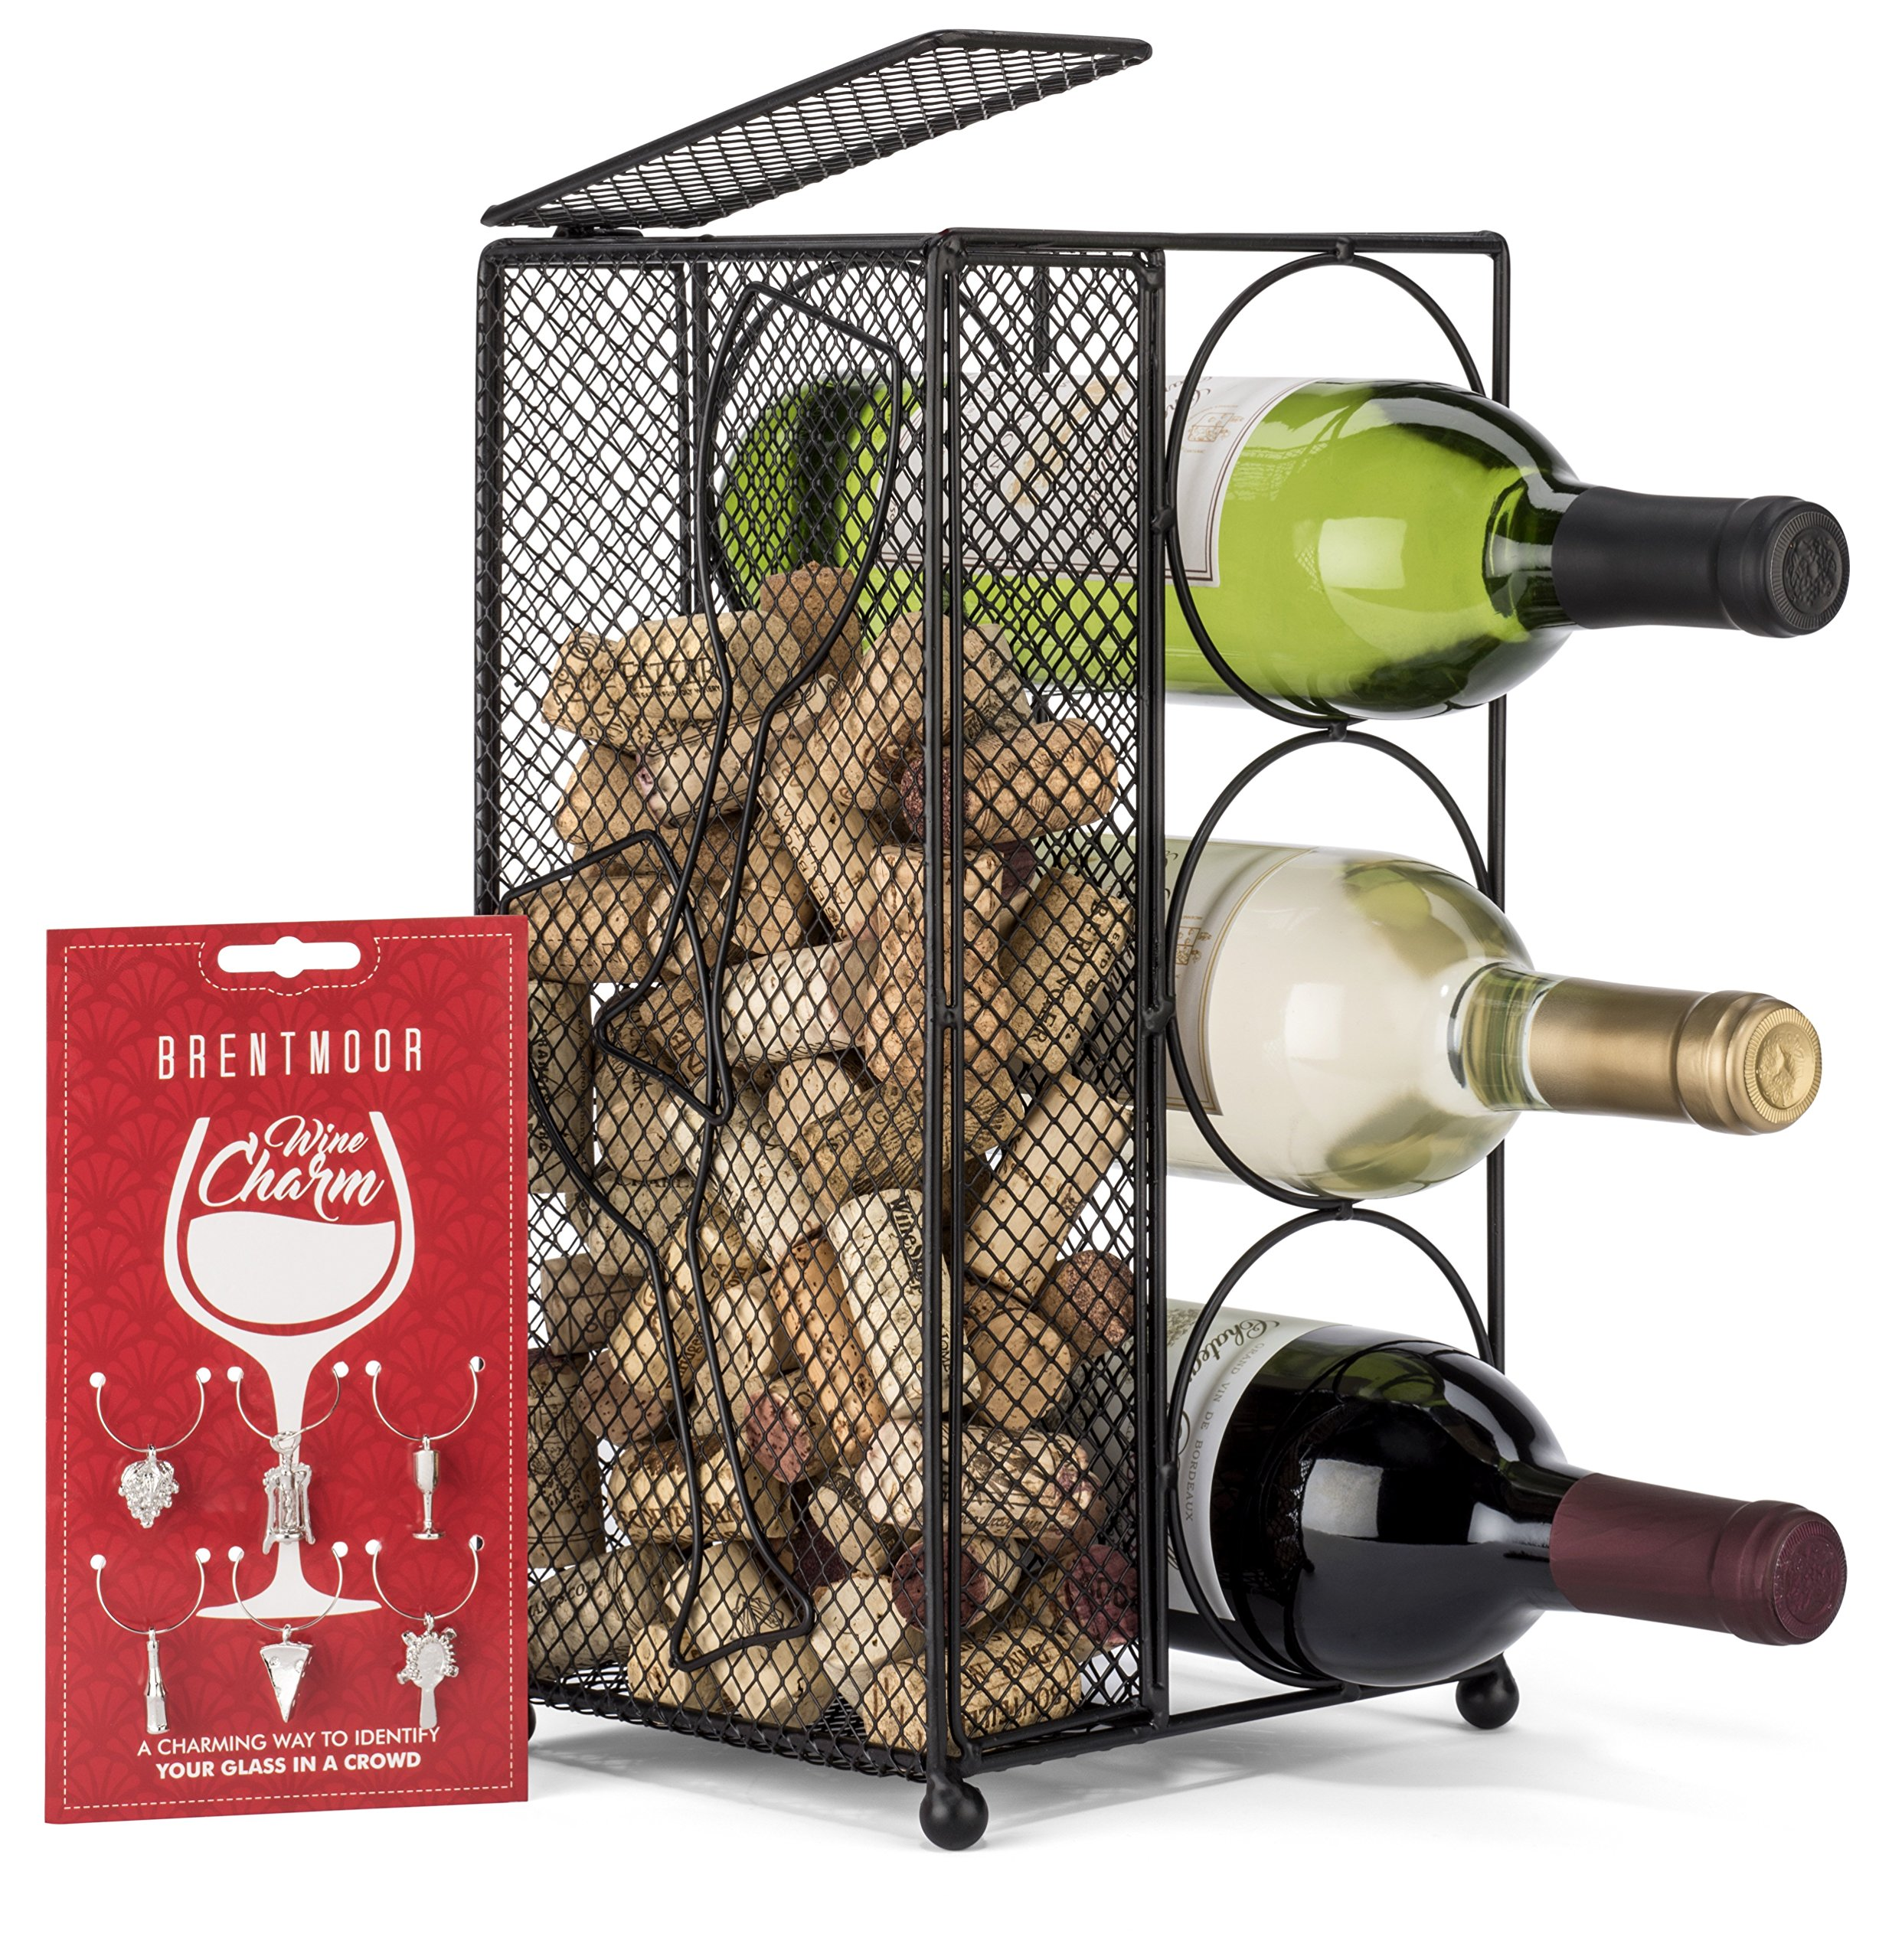 Brentmoor - 3 Bottle - Wine Rack/Cork Holder - Black - Complete w/Wine Charms